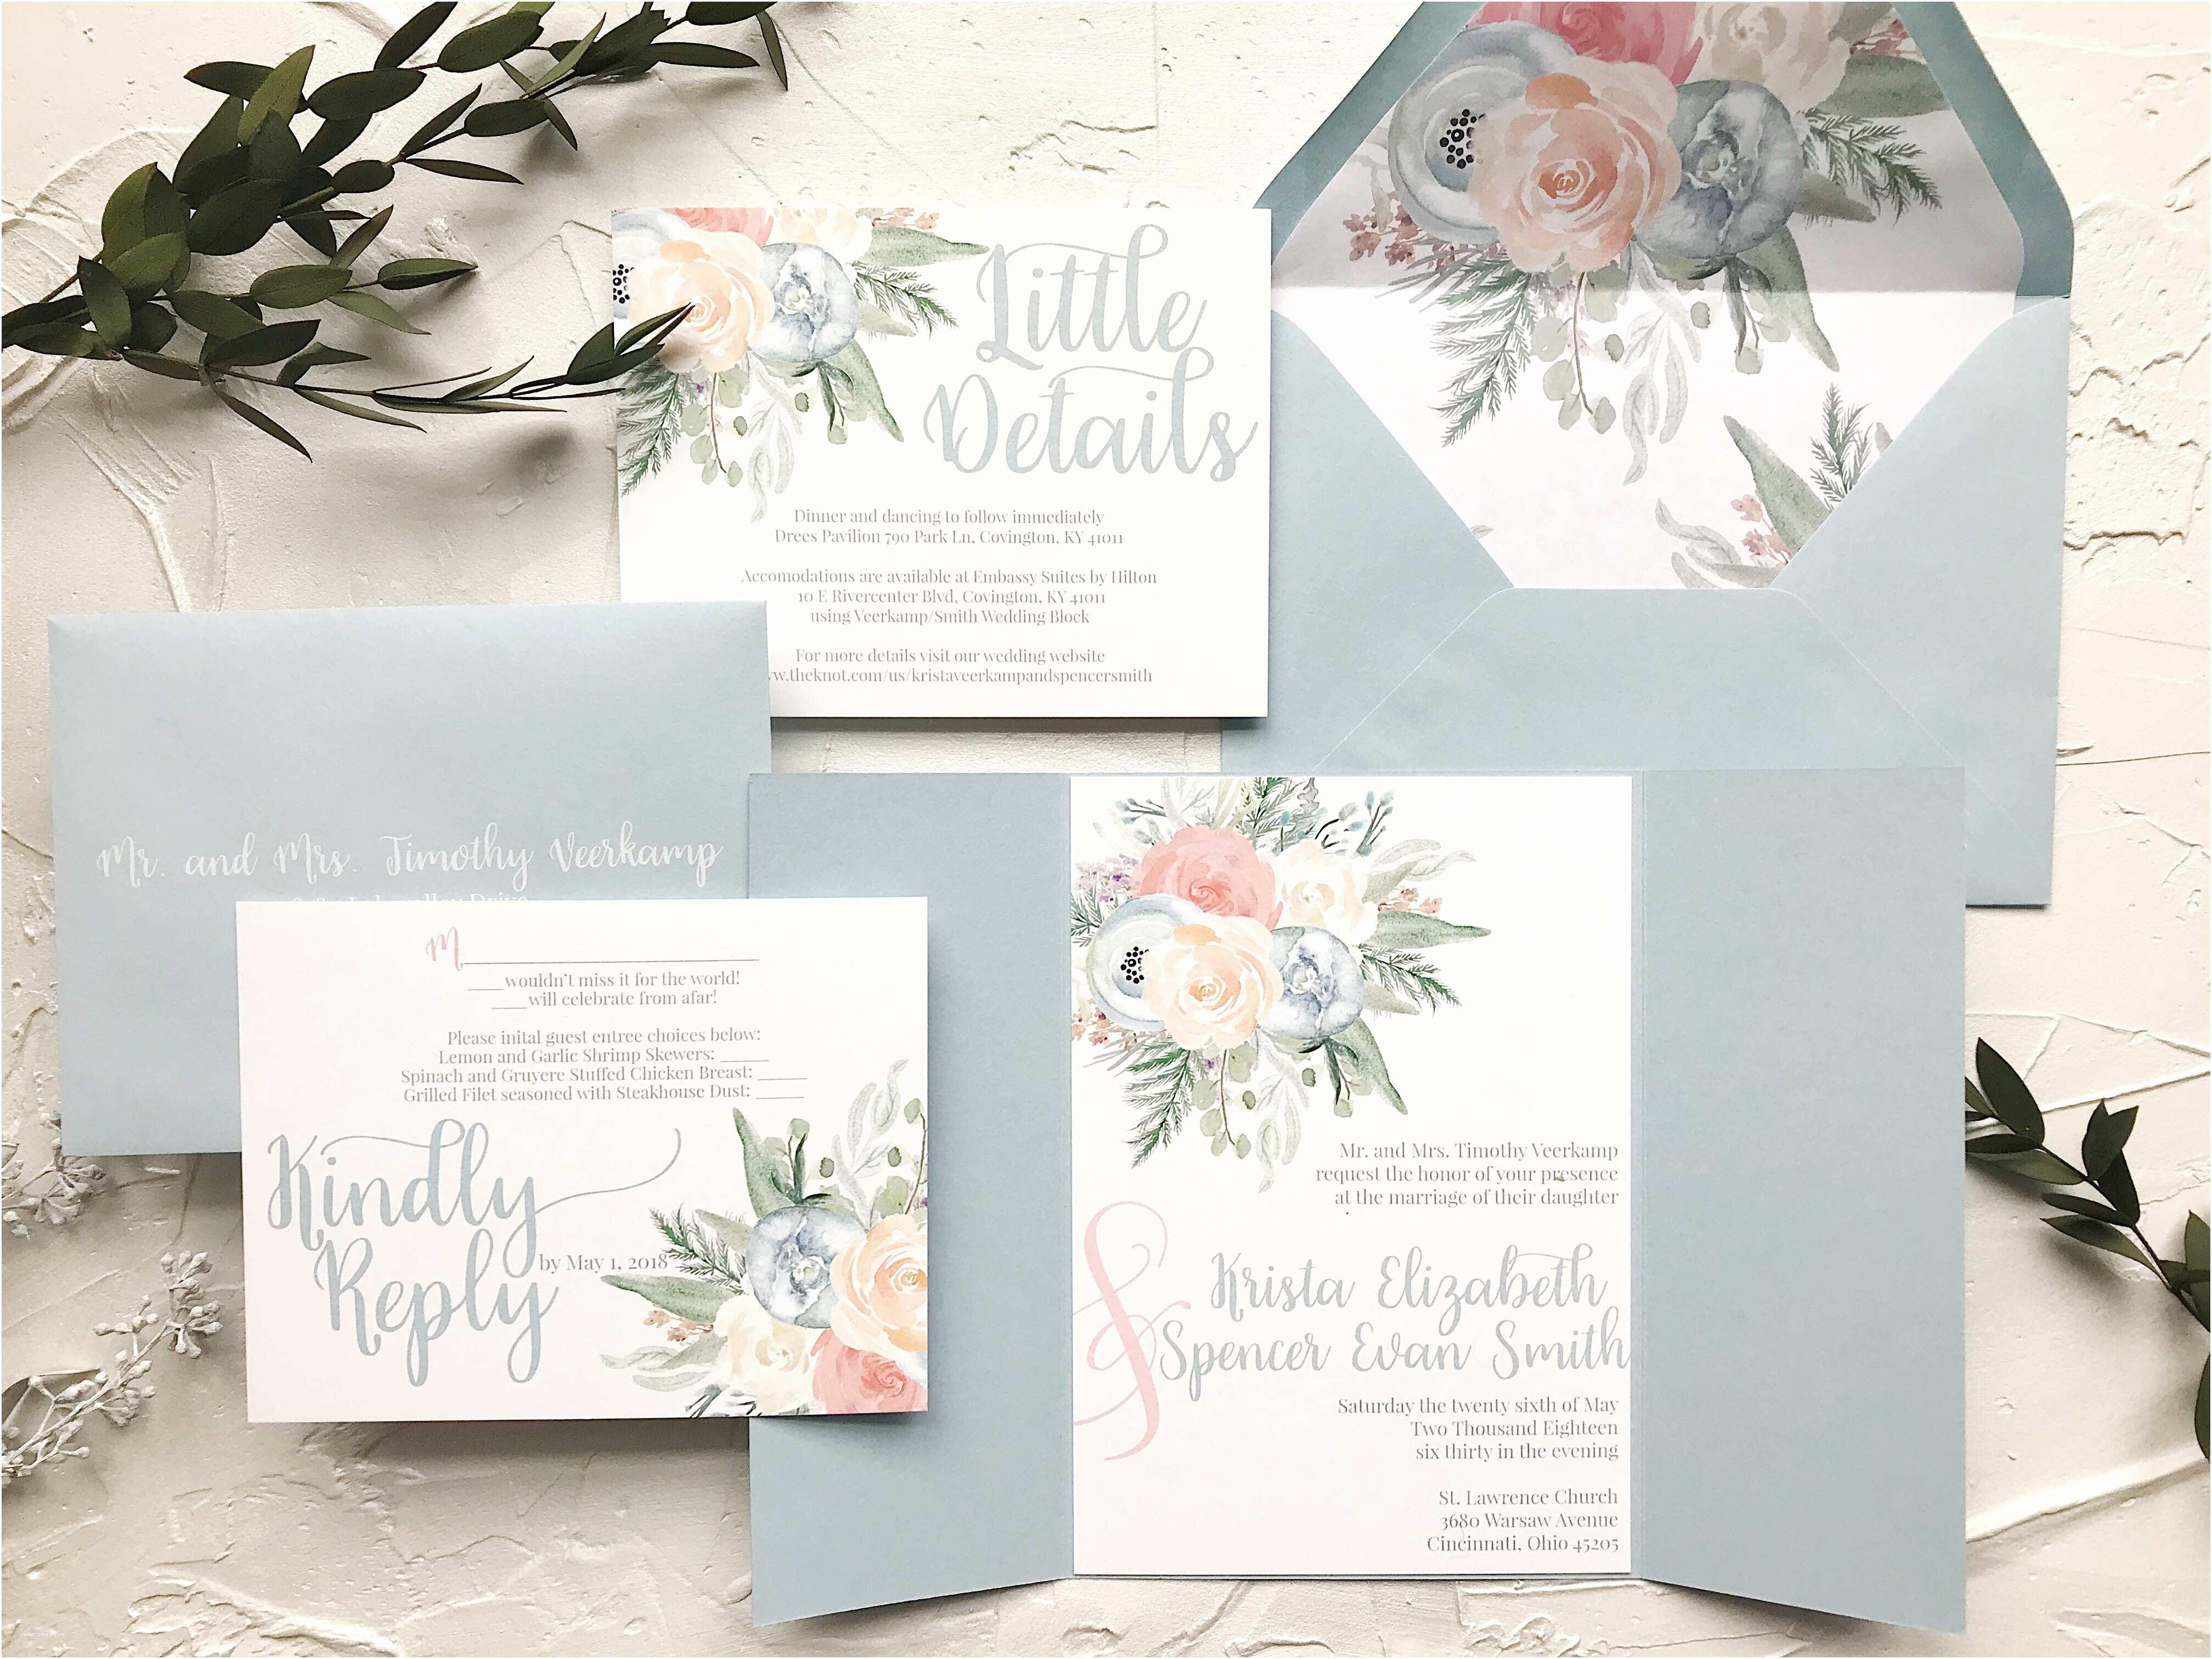 Best Wedding Invitation Sites Invitation Reveal Dusty Blue and Peach Florals Unicaforma